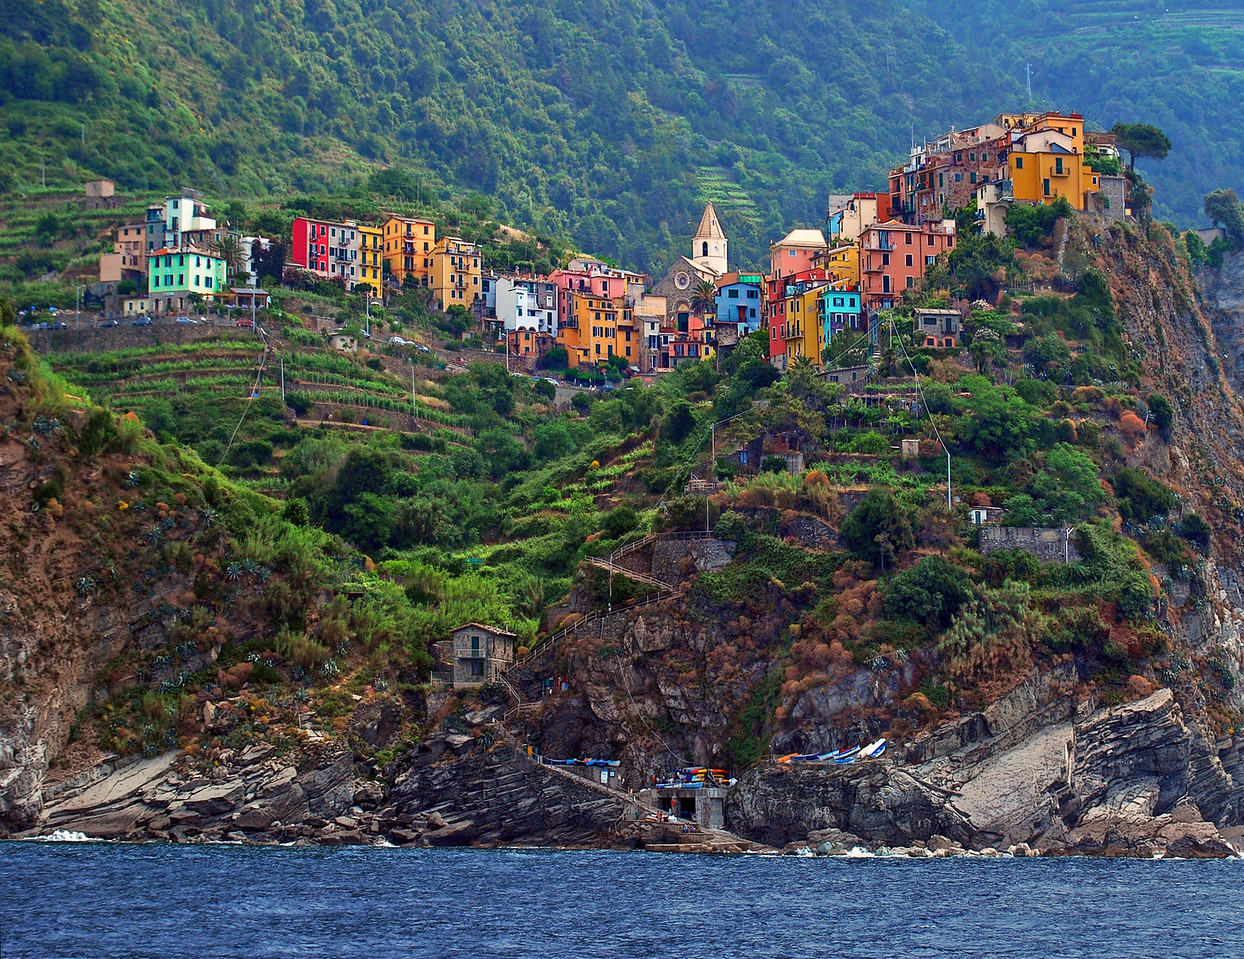 Cinque Terre - Italian Riviera